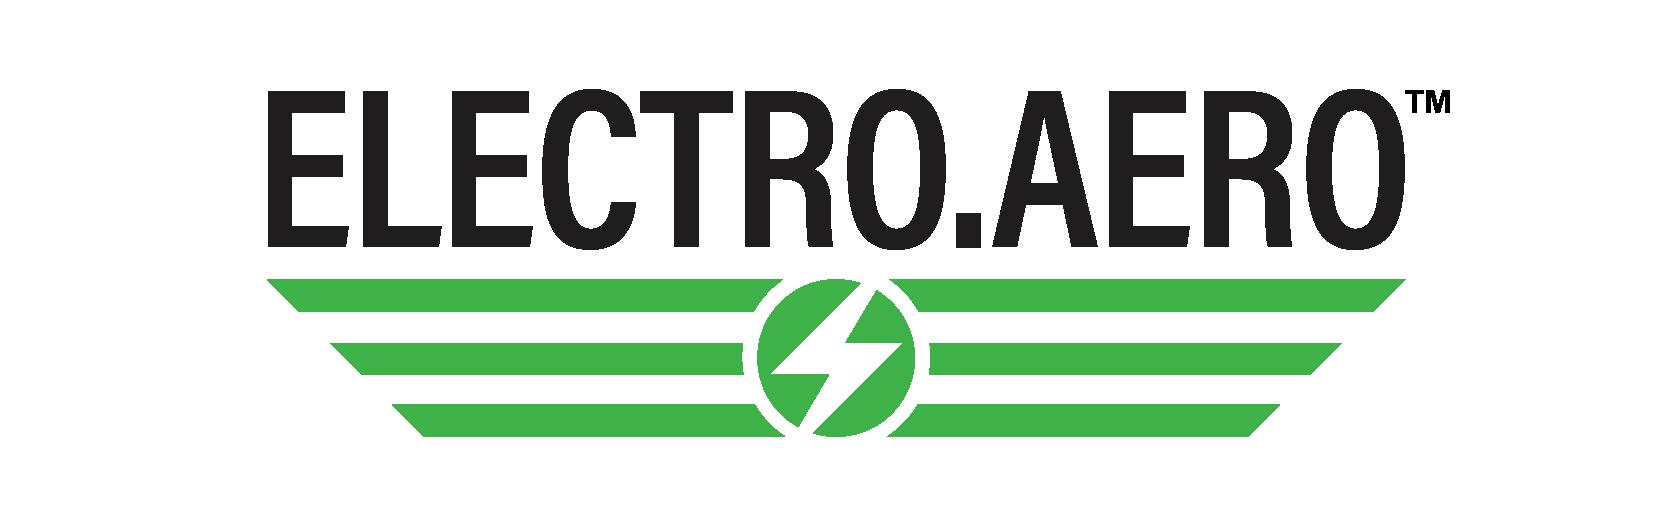 logo_electro.aero_website_footer.png